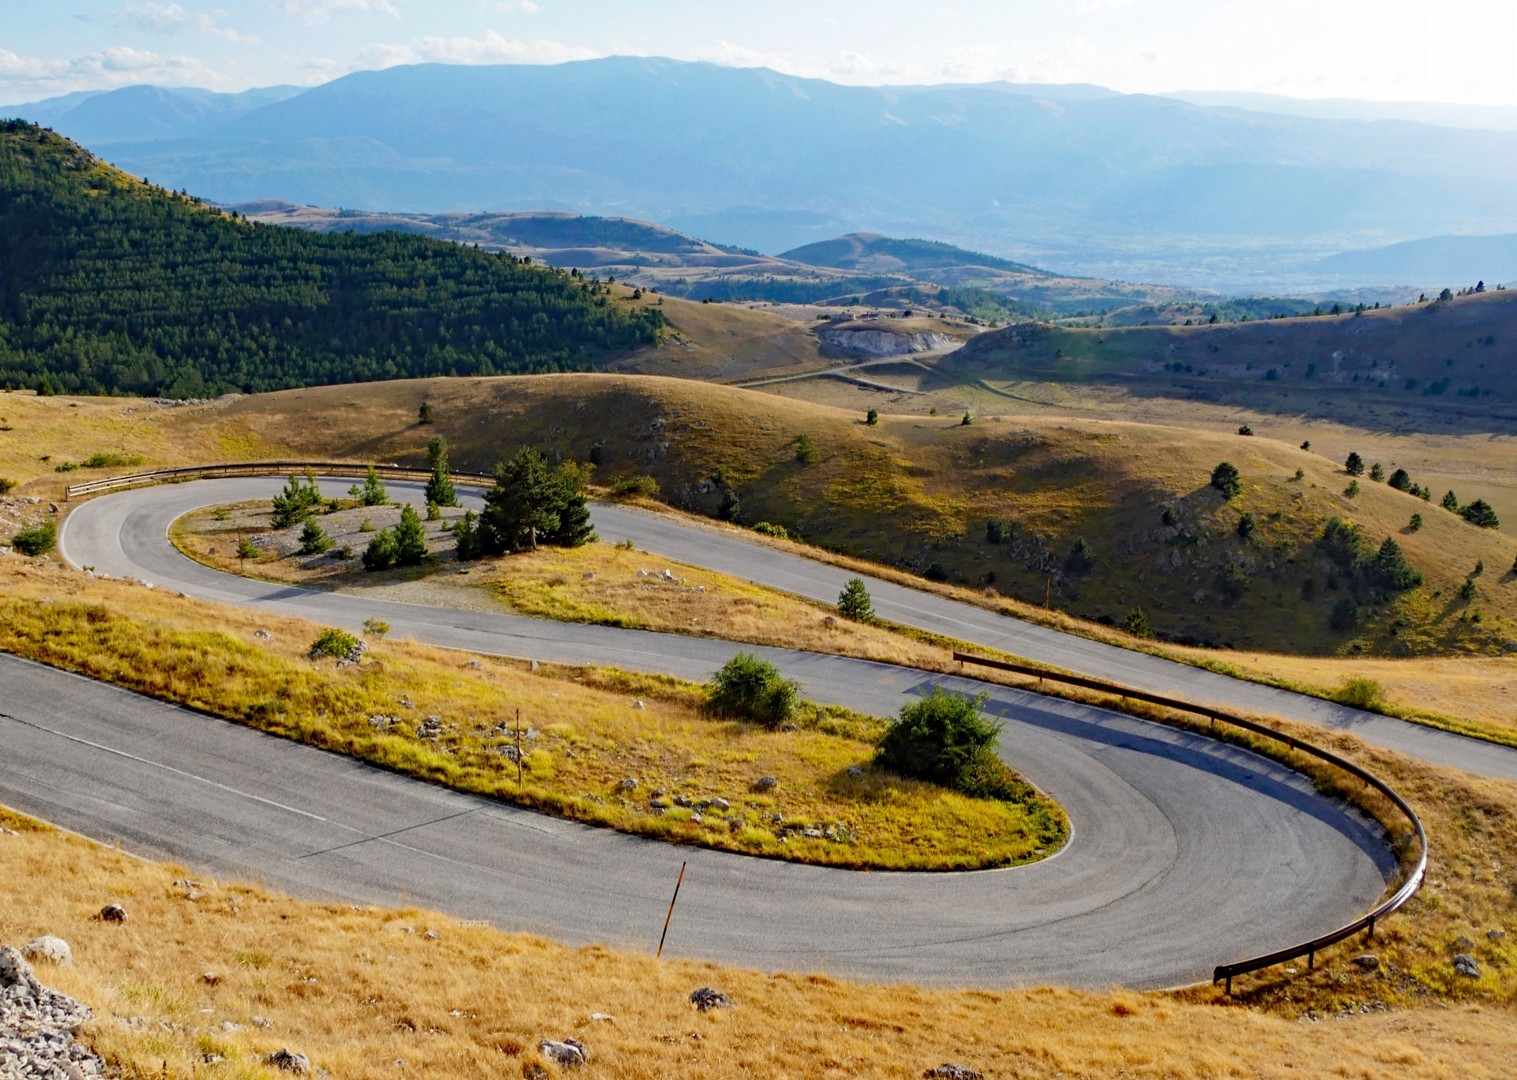 gran-sasso-hairpins-road-cycling-italy.jpg - Italy - Grand Traverse - North to South - Guided Road Cycling Holiday (17 days) - Road Cycling